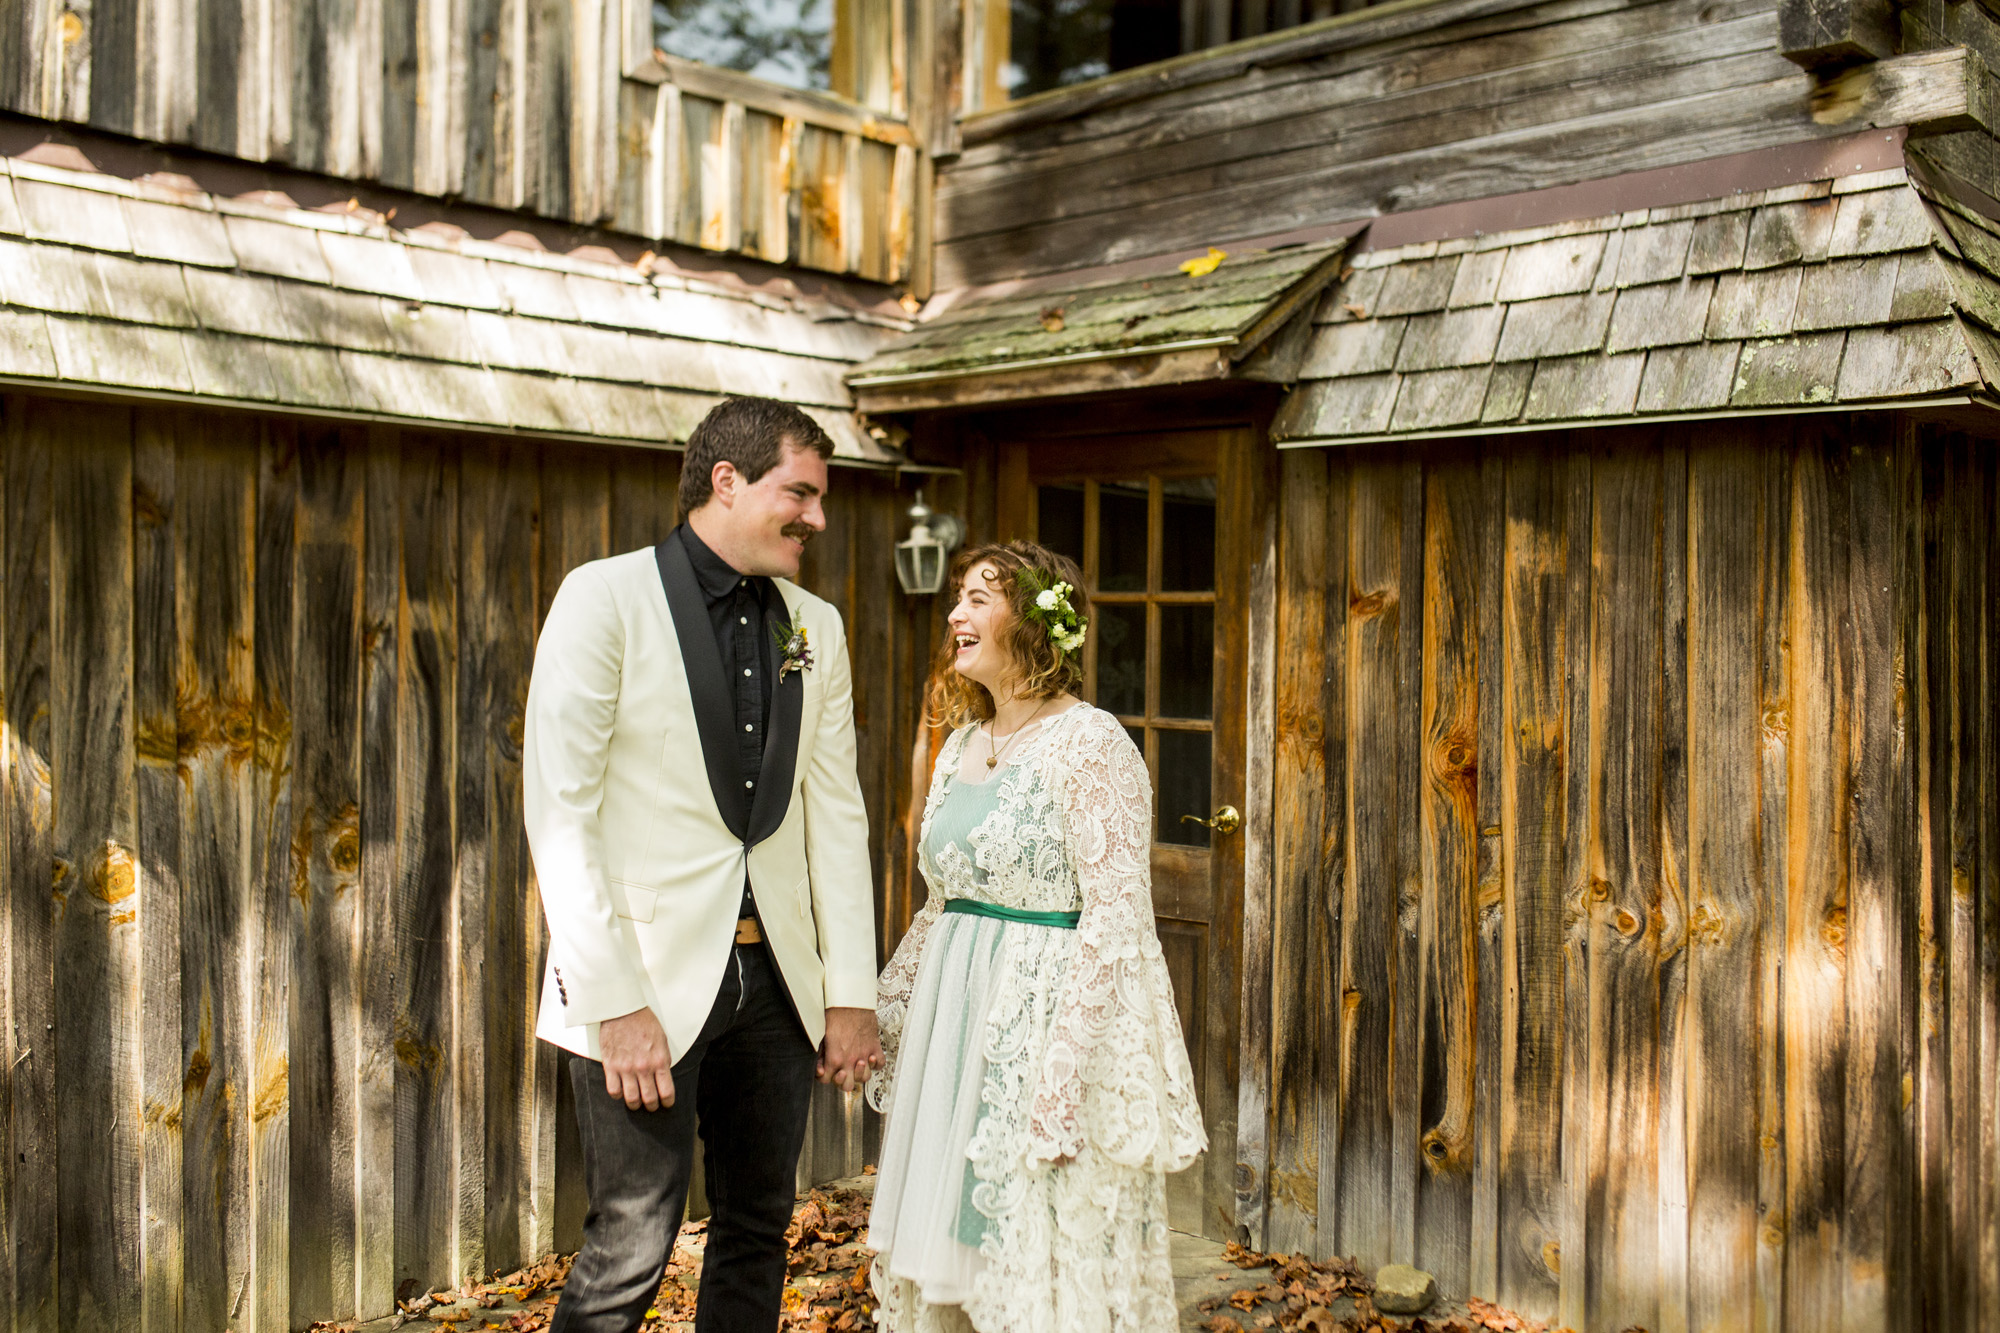 Seriously_Sabrina_Photography_Red_River_Gorge_Kentucky_Wedding_ShawnDana66.jpg